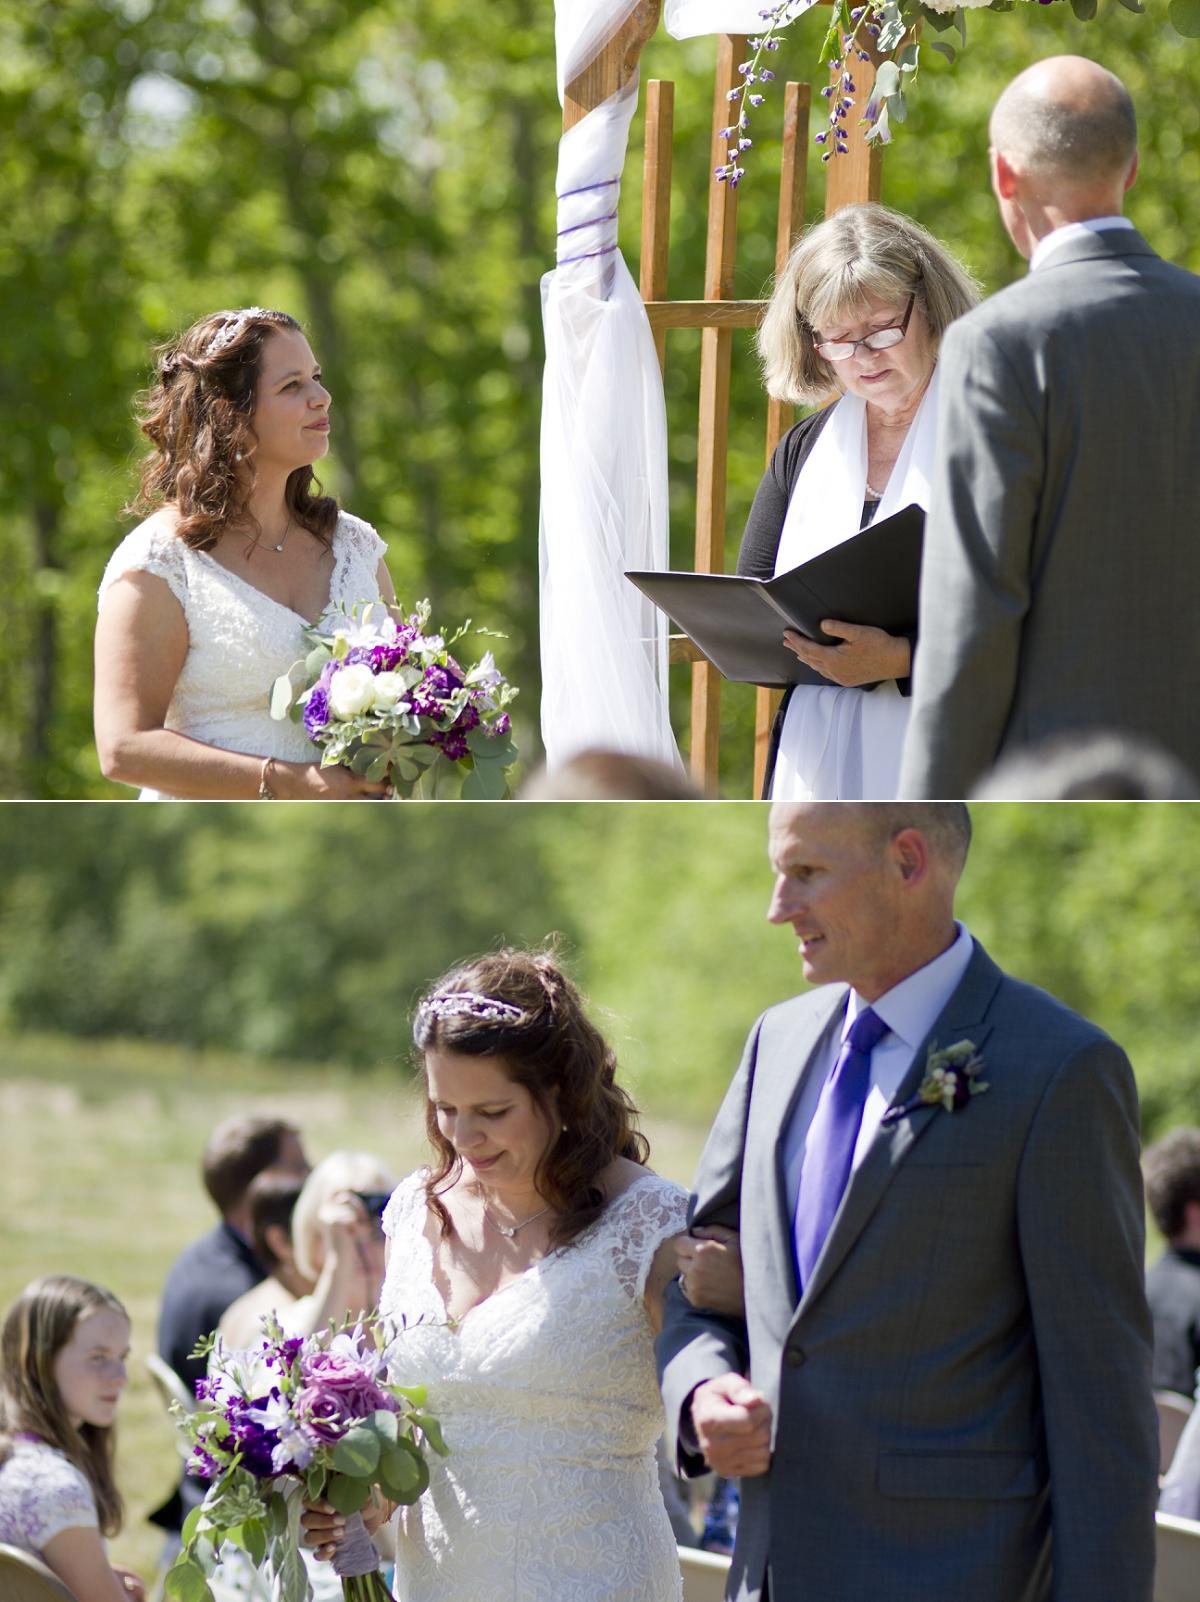 Mountain-Lake-Wedding-Photos-_0011.jpg